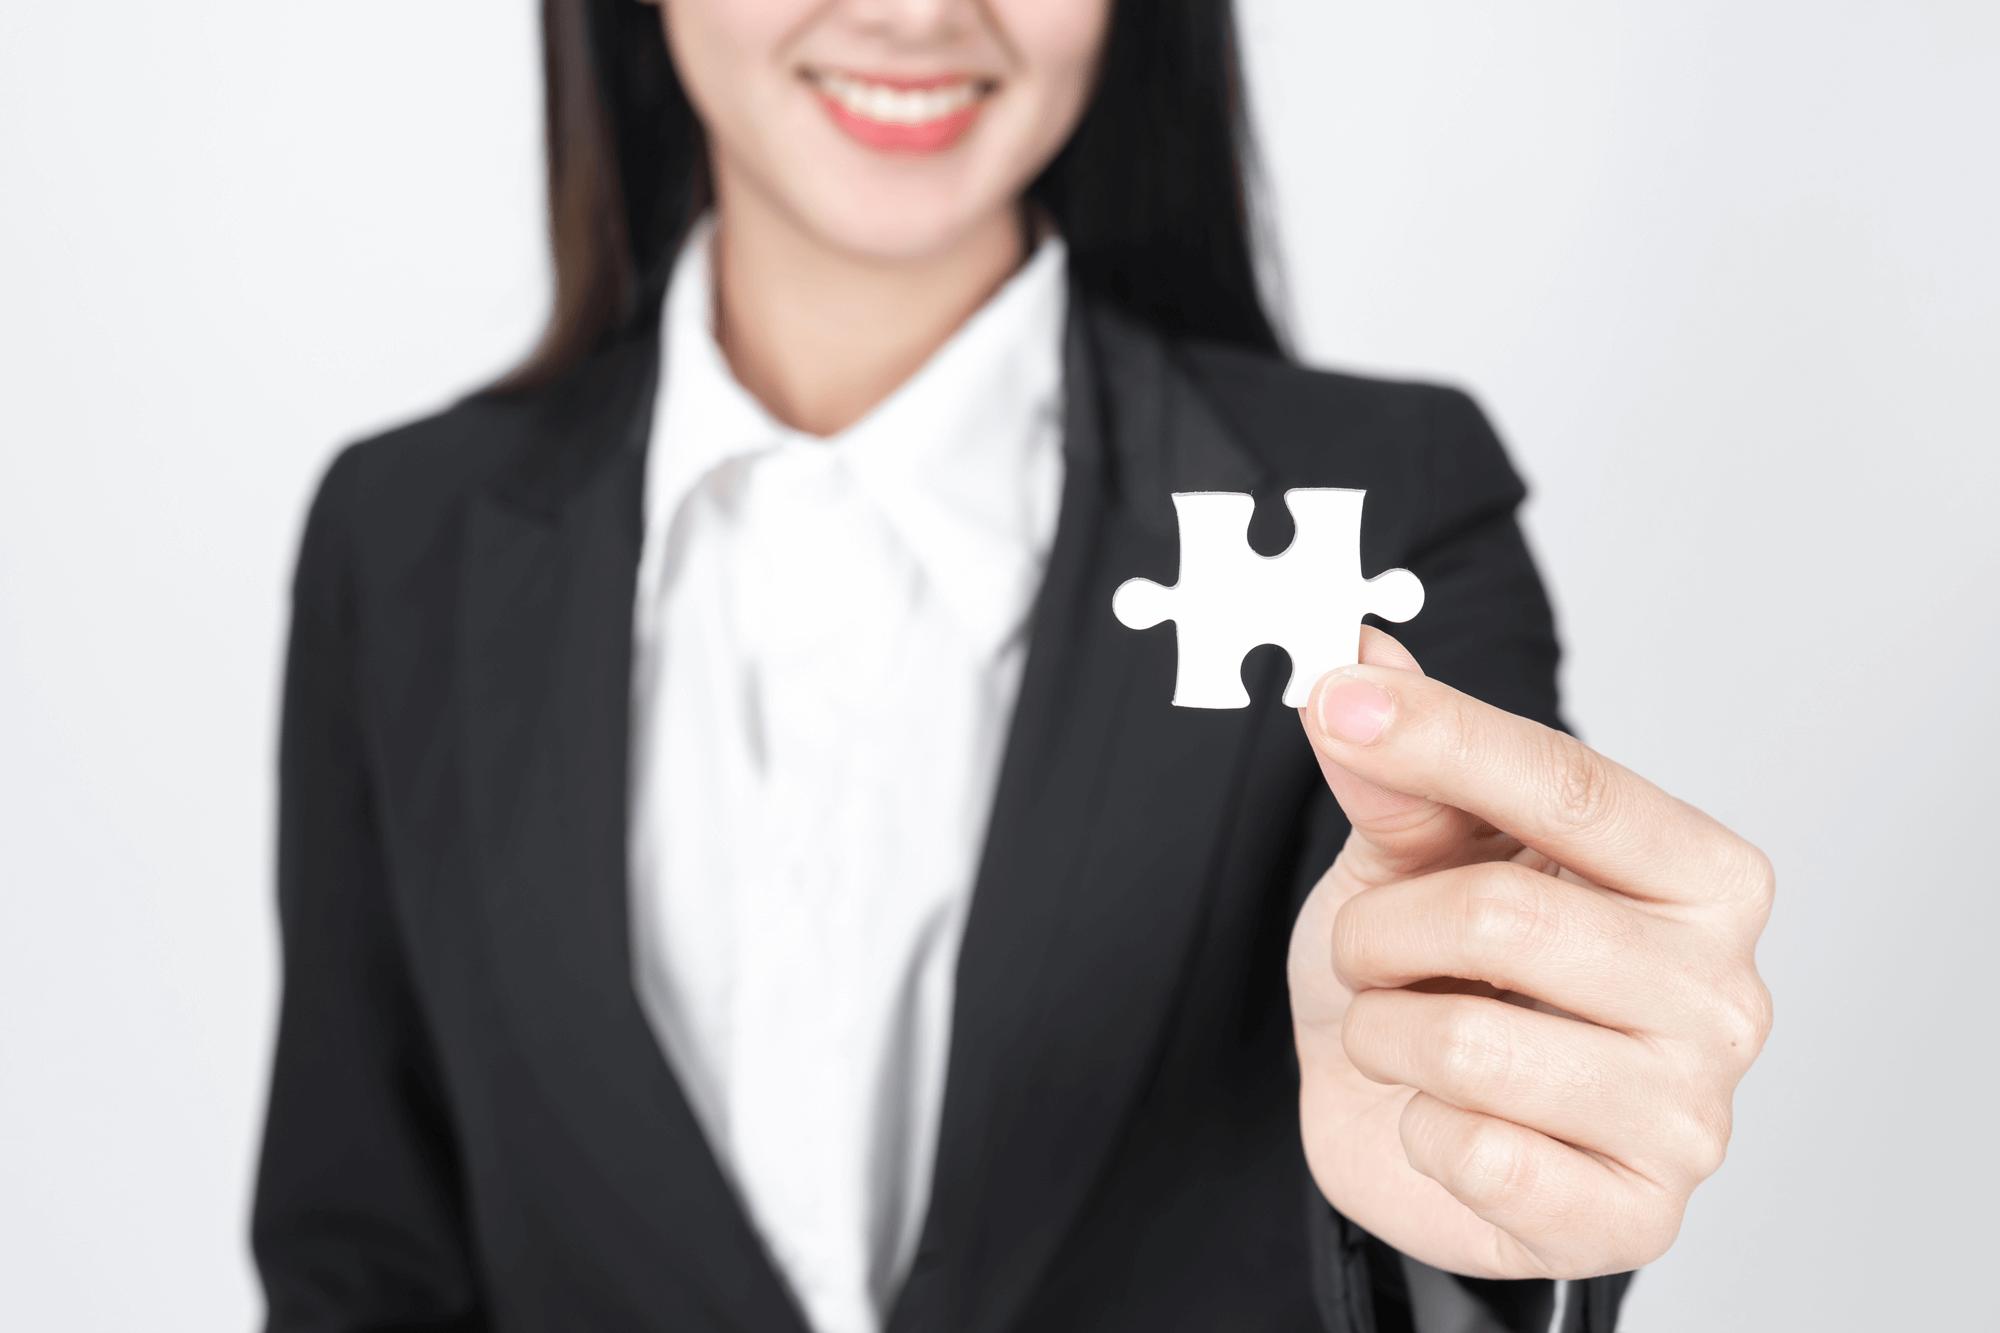 Microsoft scoort met Power BI | BI Tools Survey 2019 | Analytics